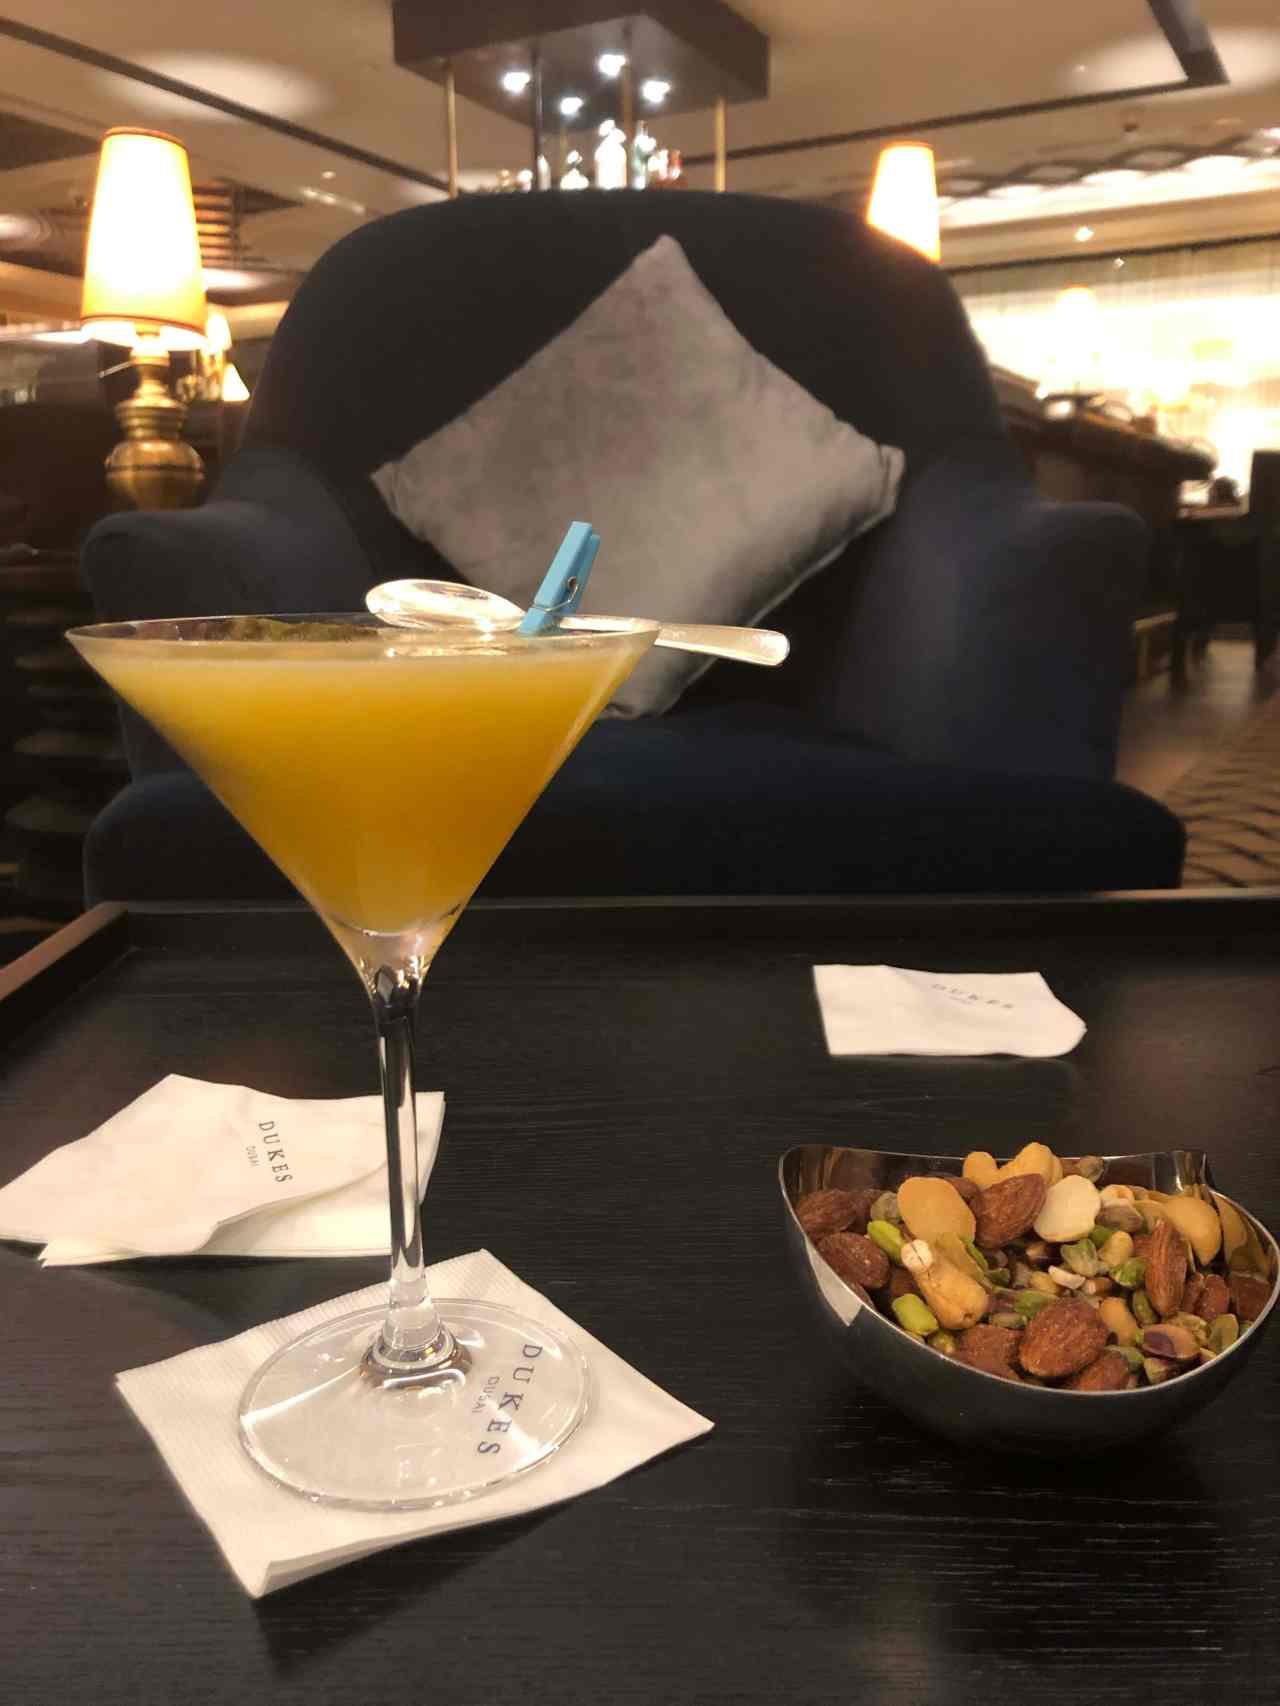 Pornstar martini at Duke's hotel